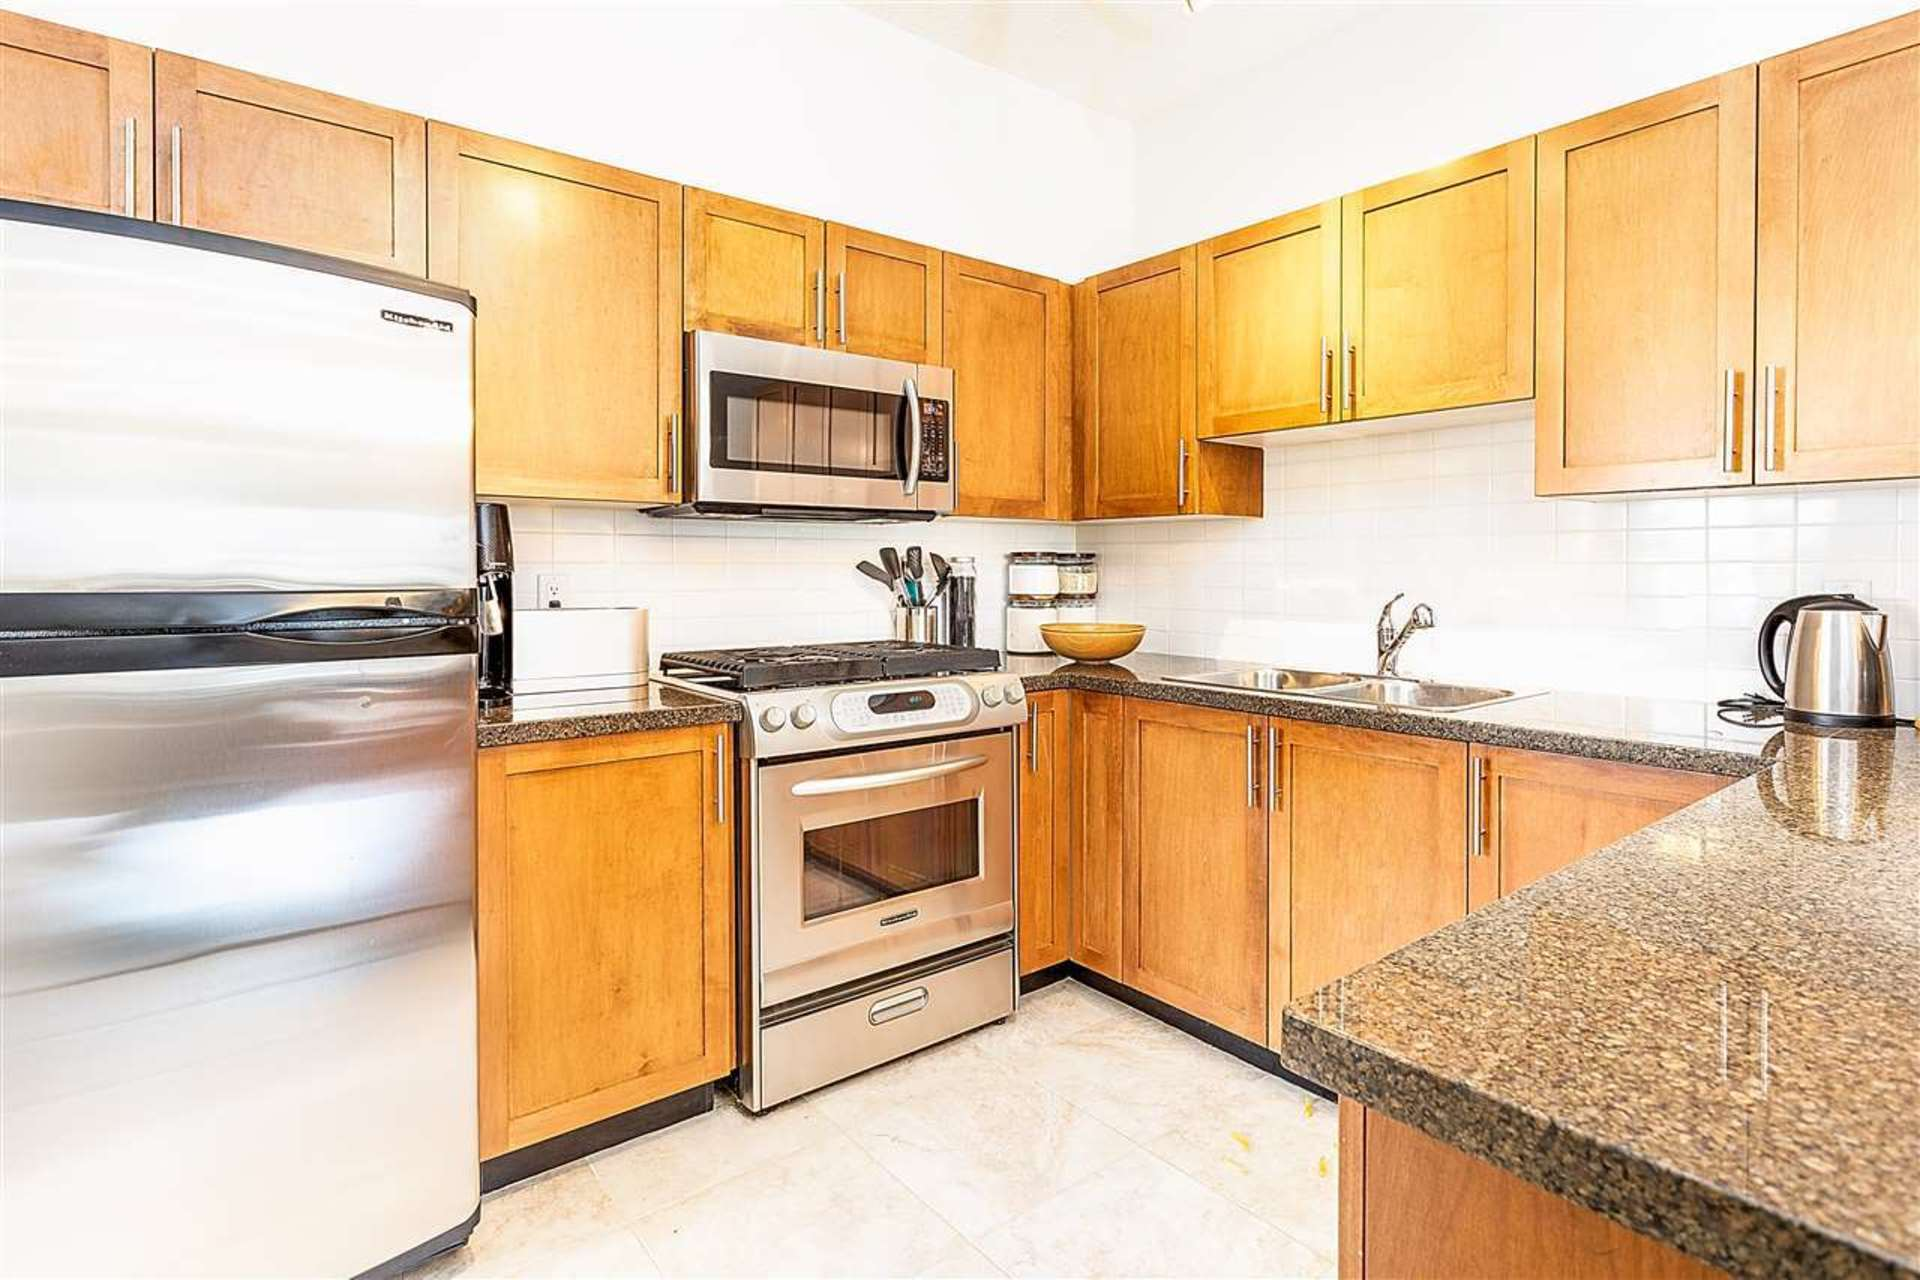 4438-albert-street-vancouver-heights-burnaby-north-07 at 110 - 4438 Albert Street, Vancouver Heights, Burnaby North